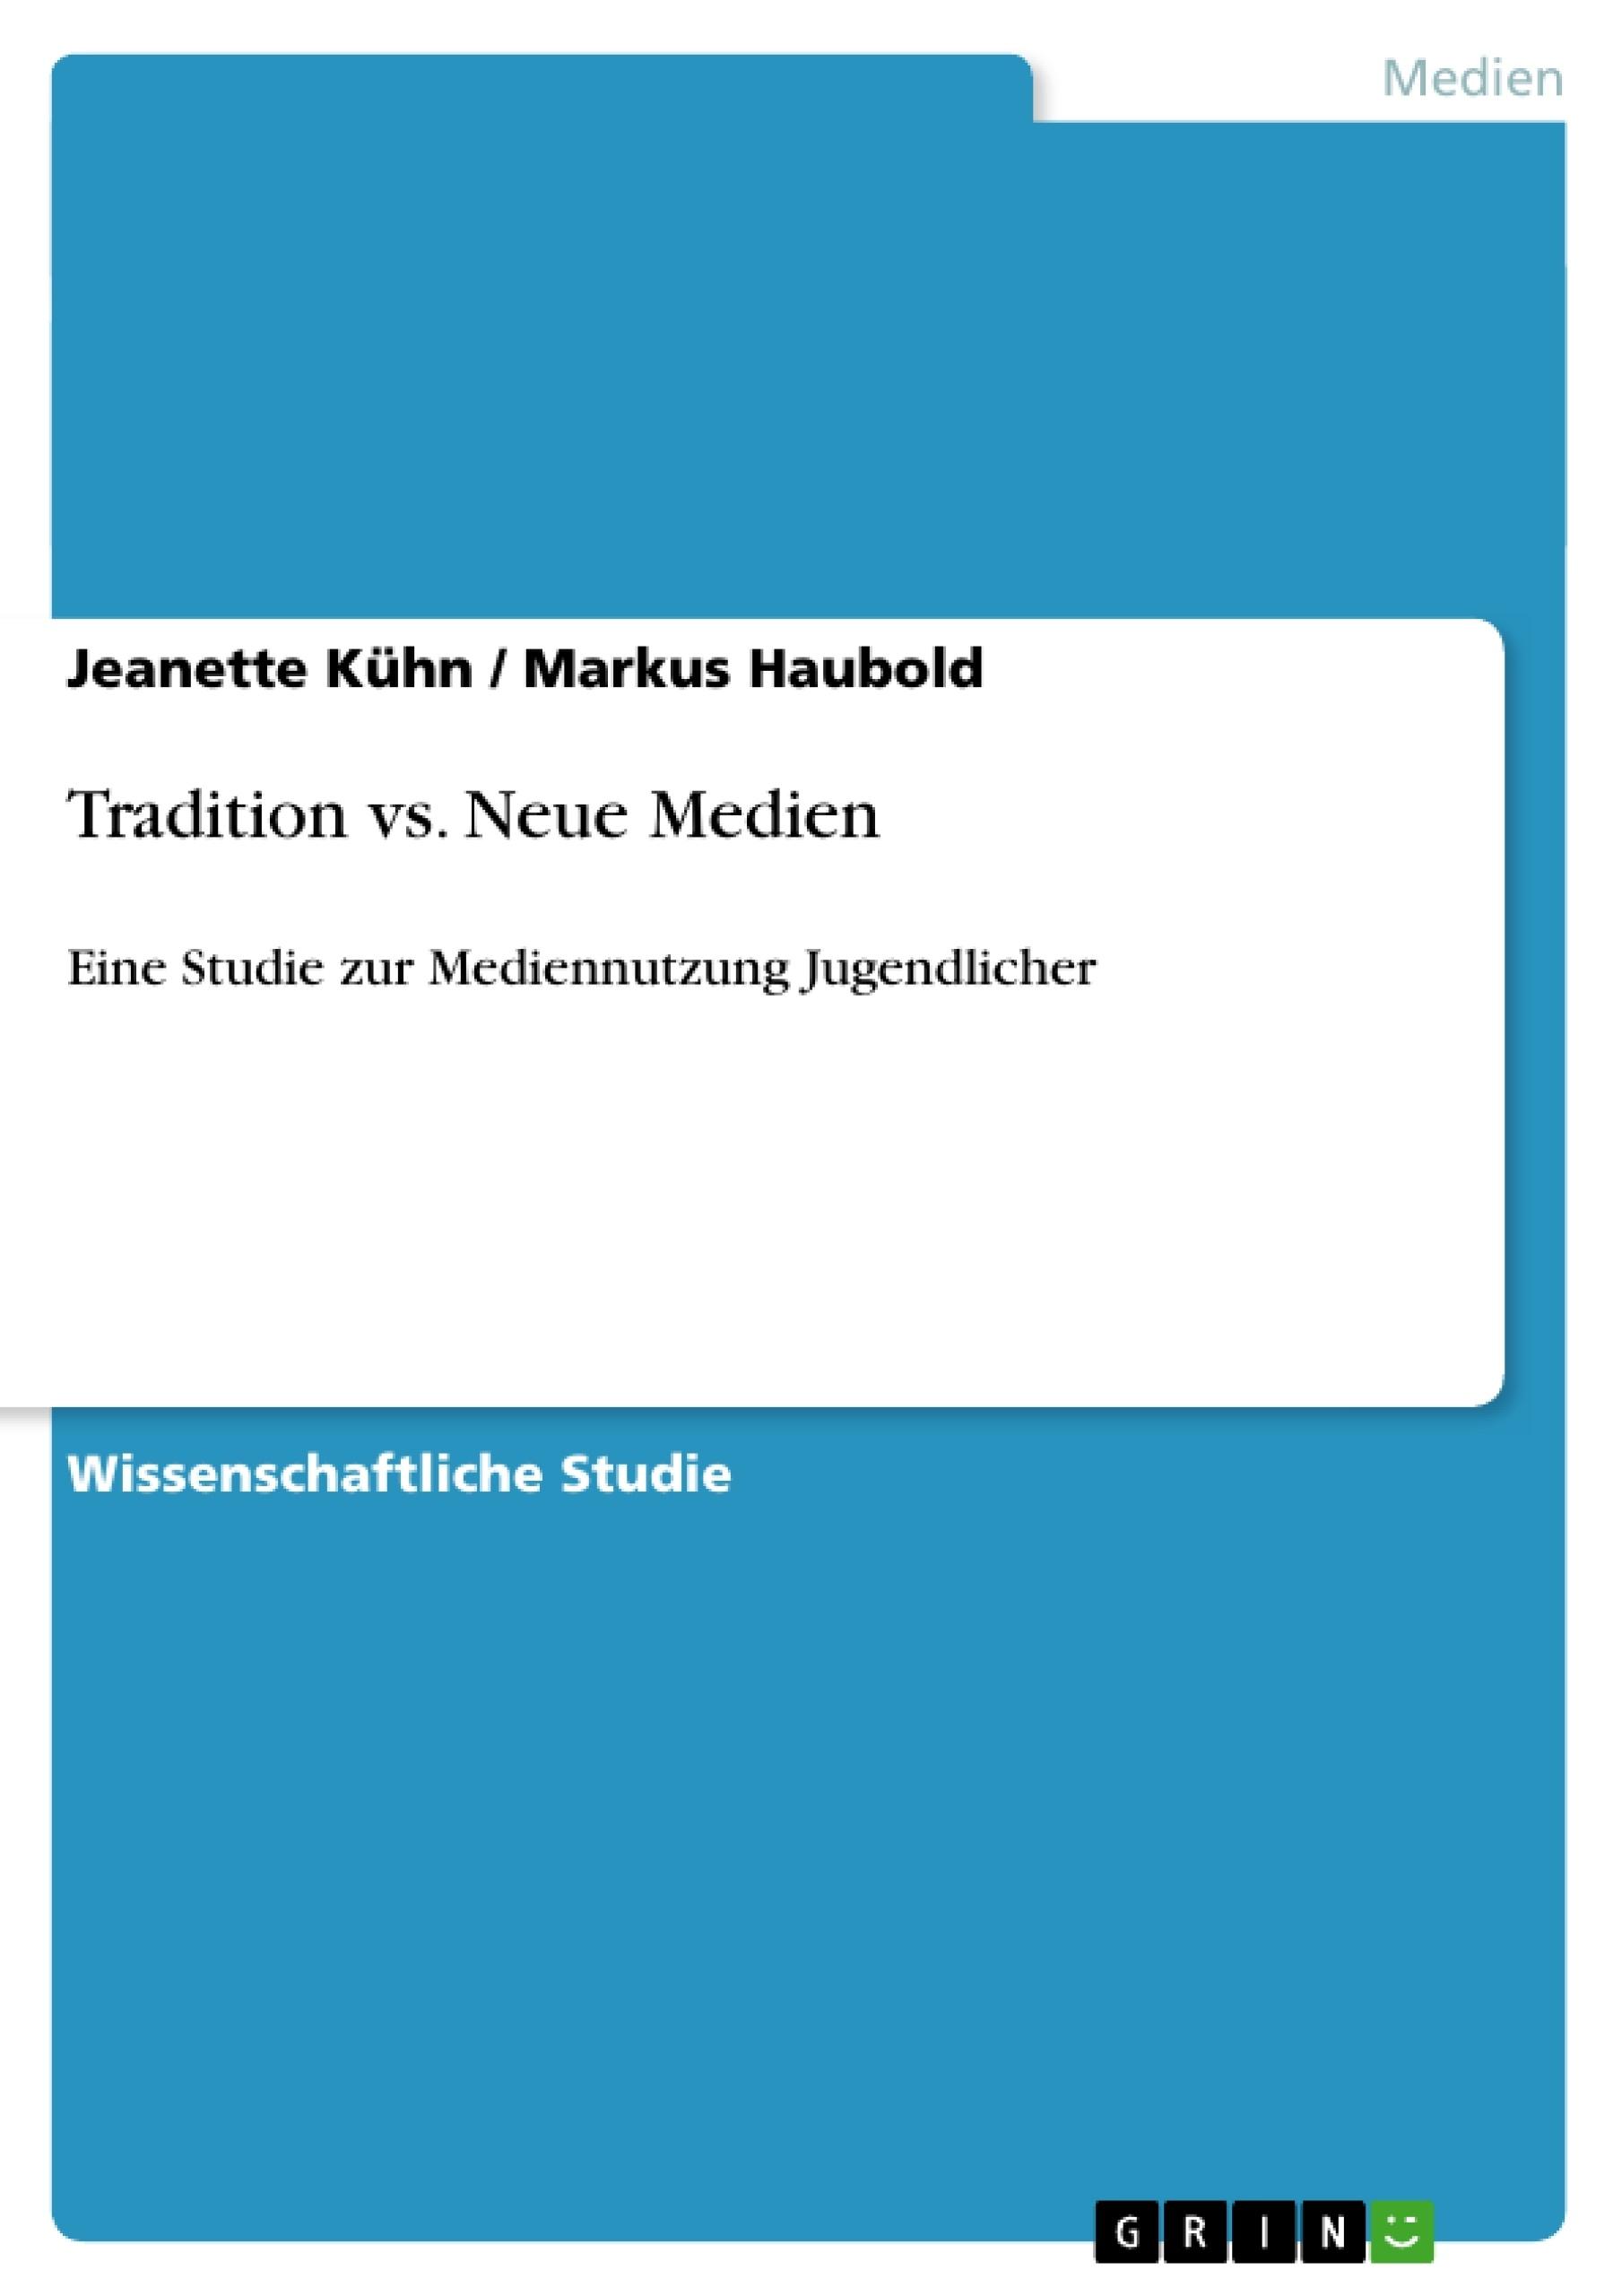 Titel: Tradition vs. Neue Medien